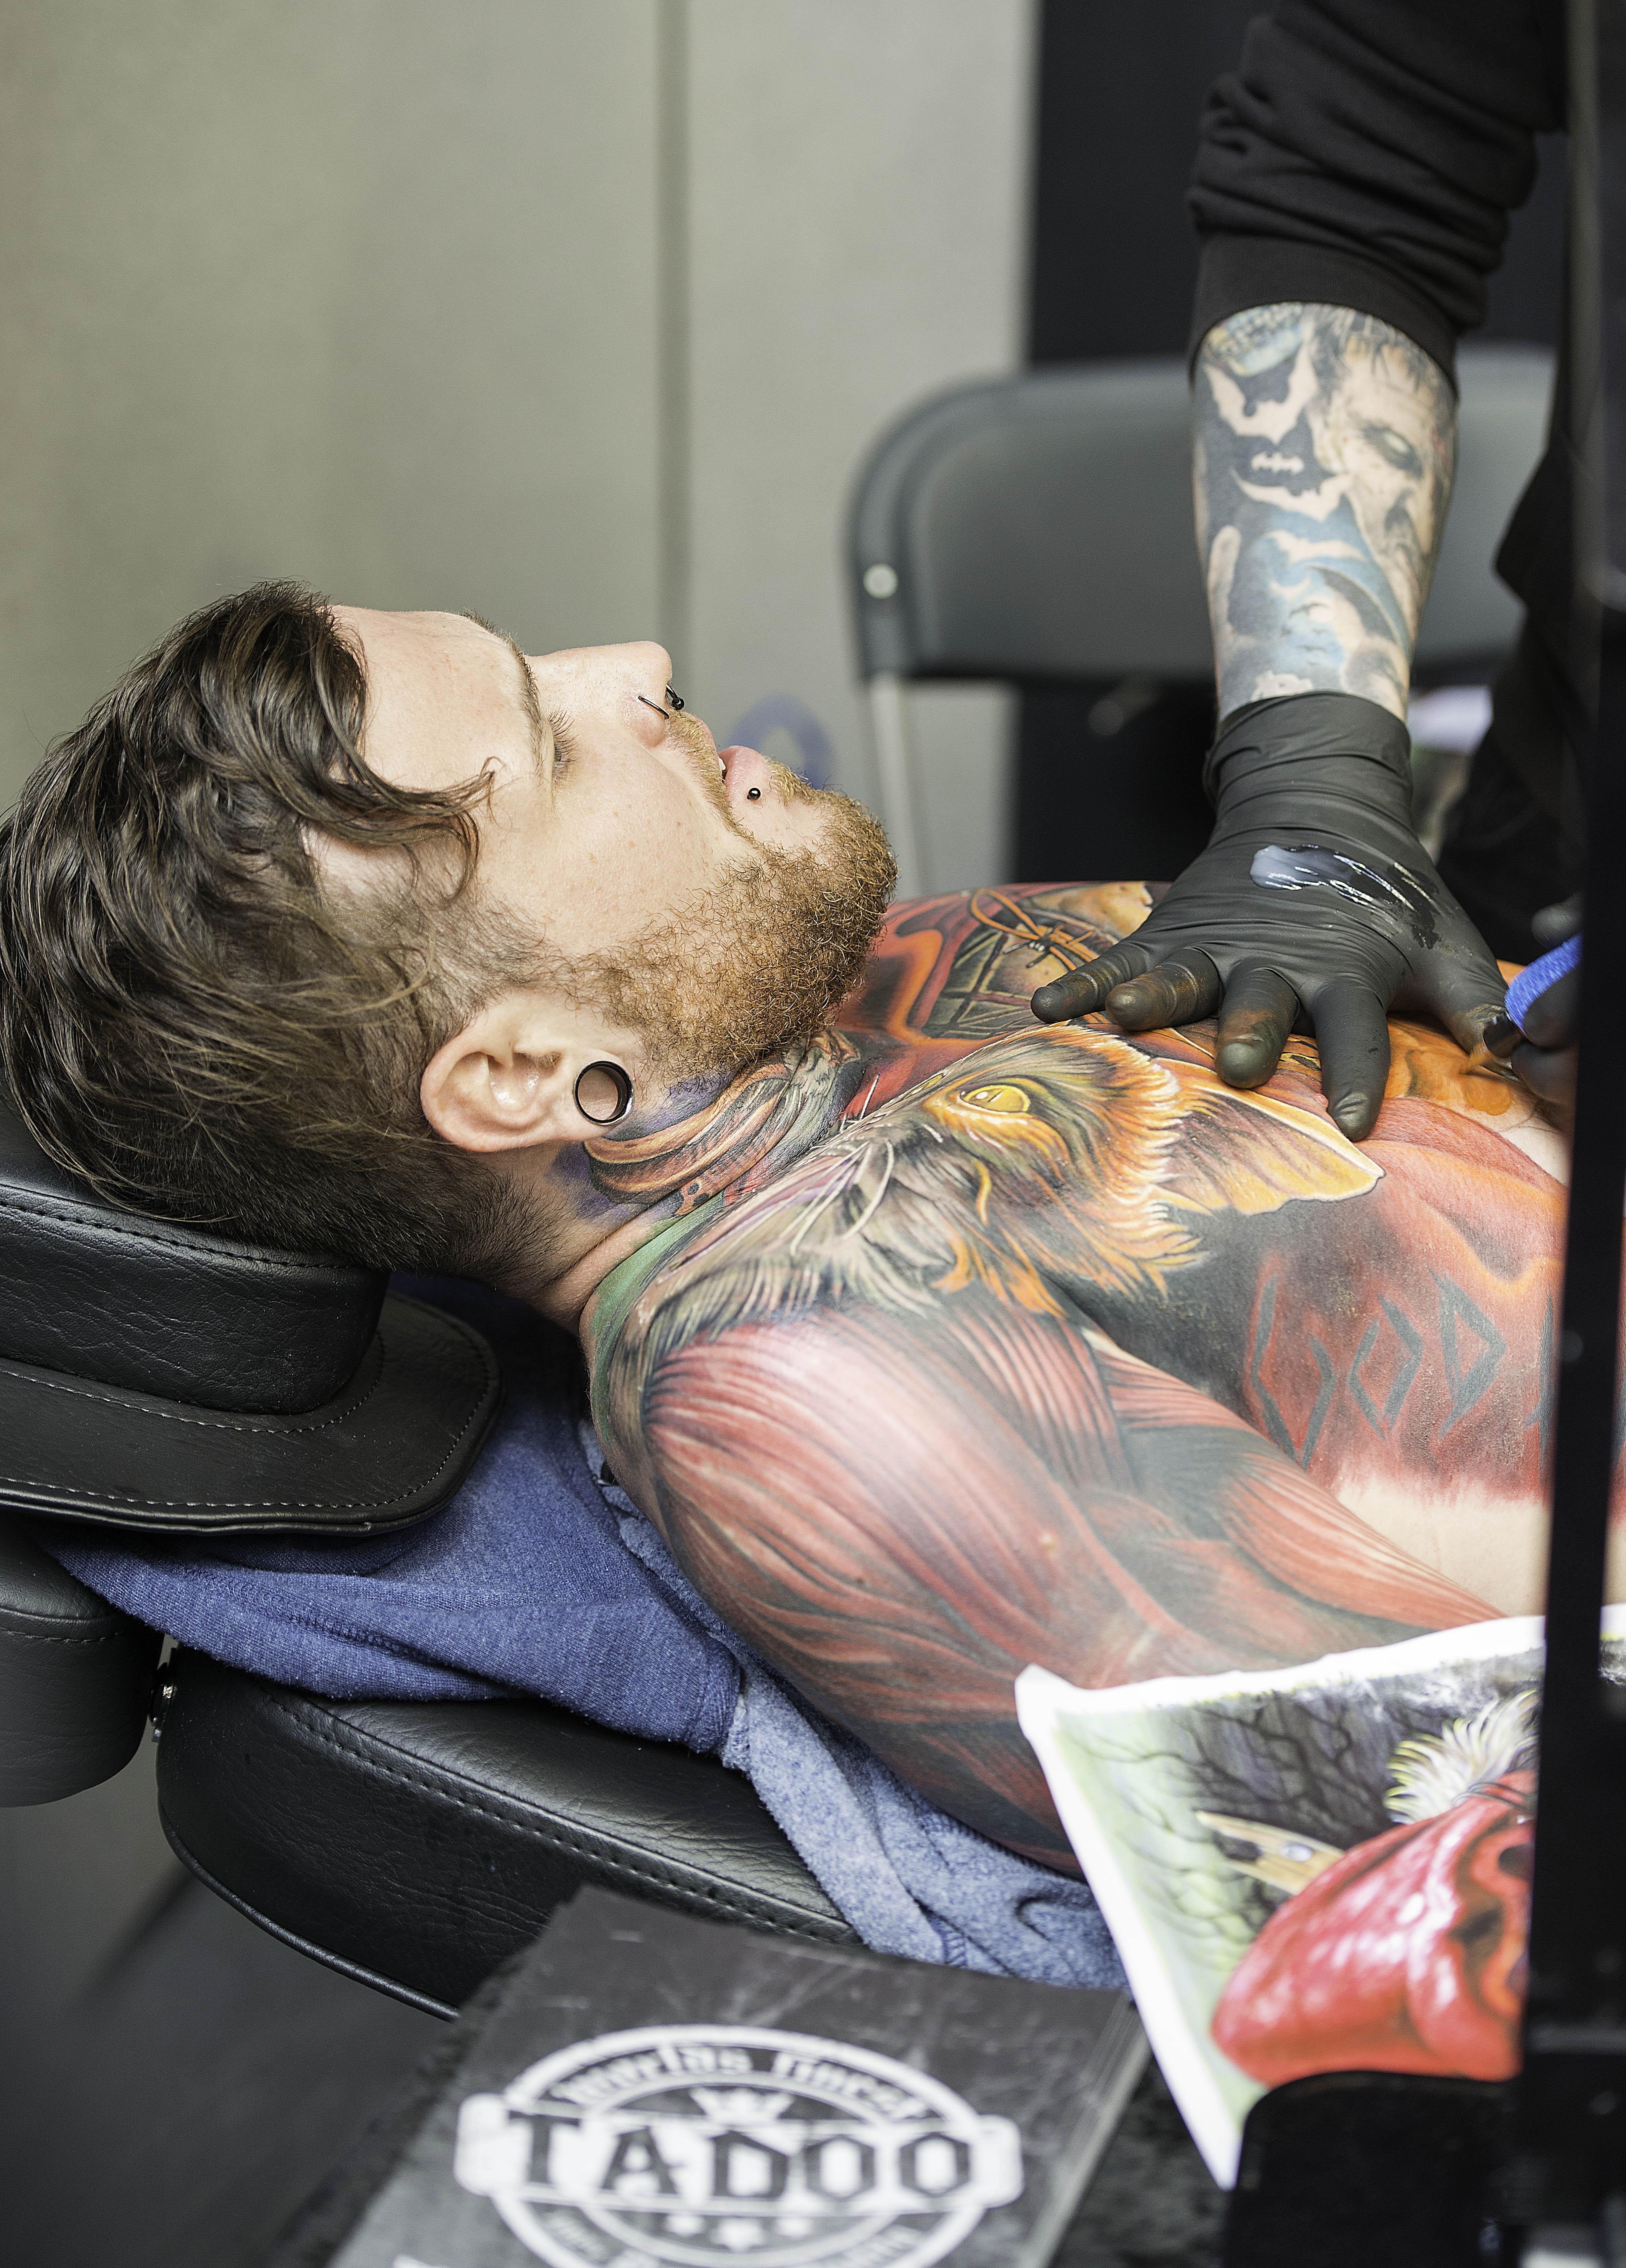 Tattoo Docklands 2483.jpg